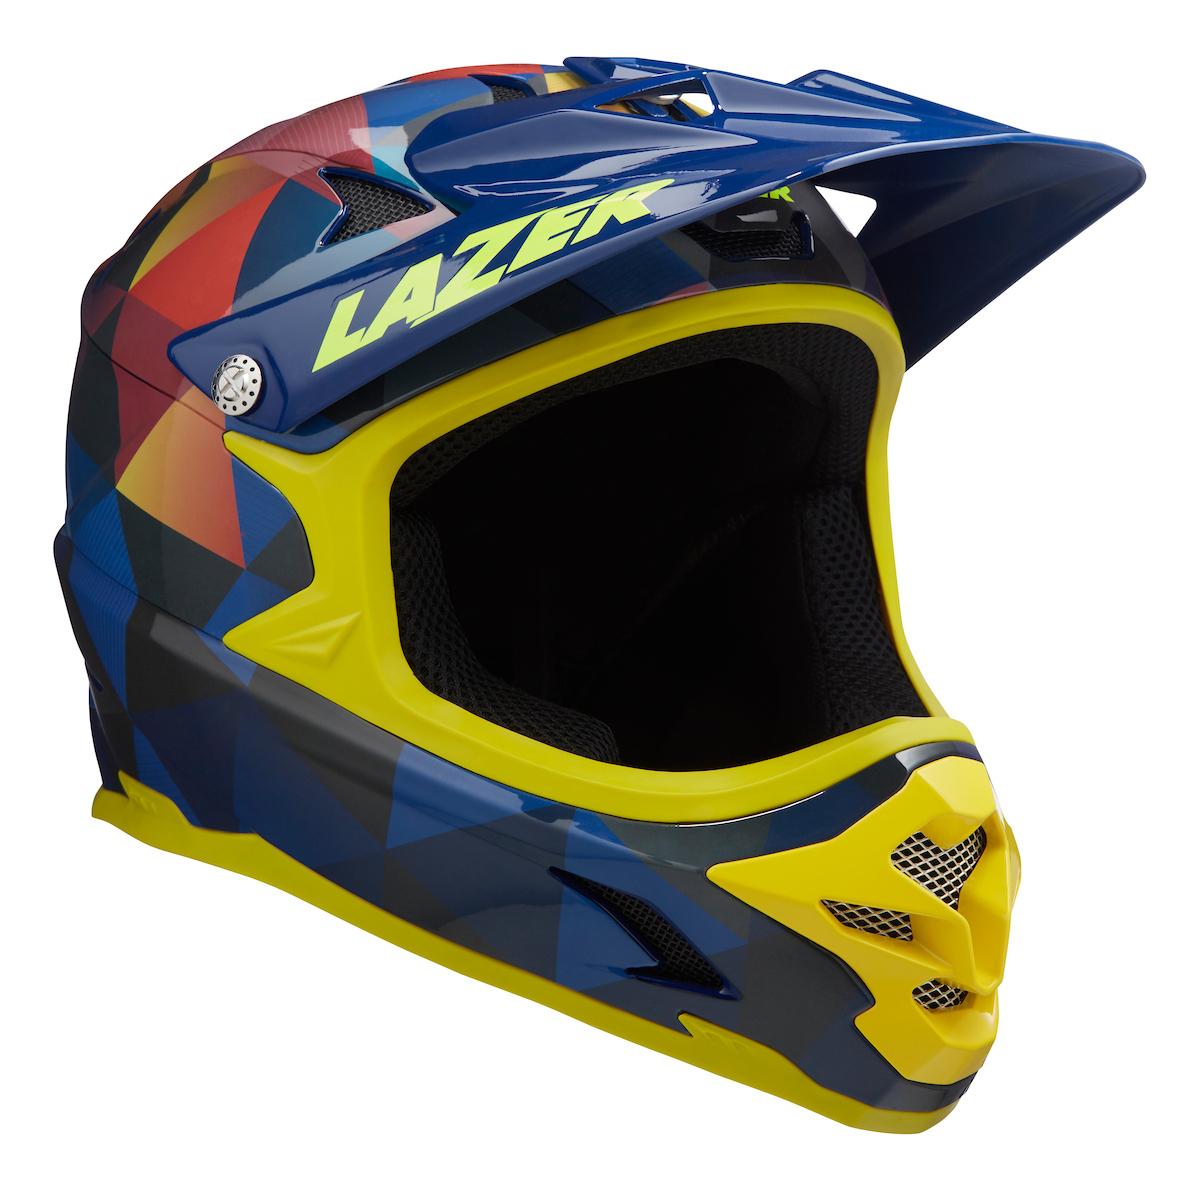 LAZER přilba Phoenix+ CE/ žluto modrá TRIANGLES S